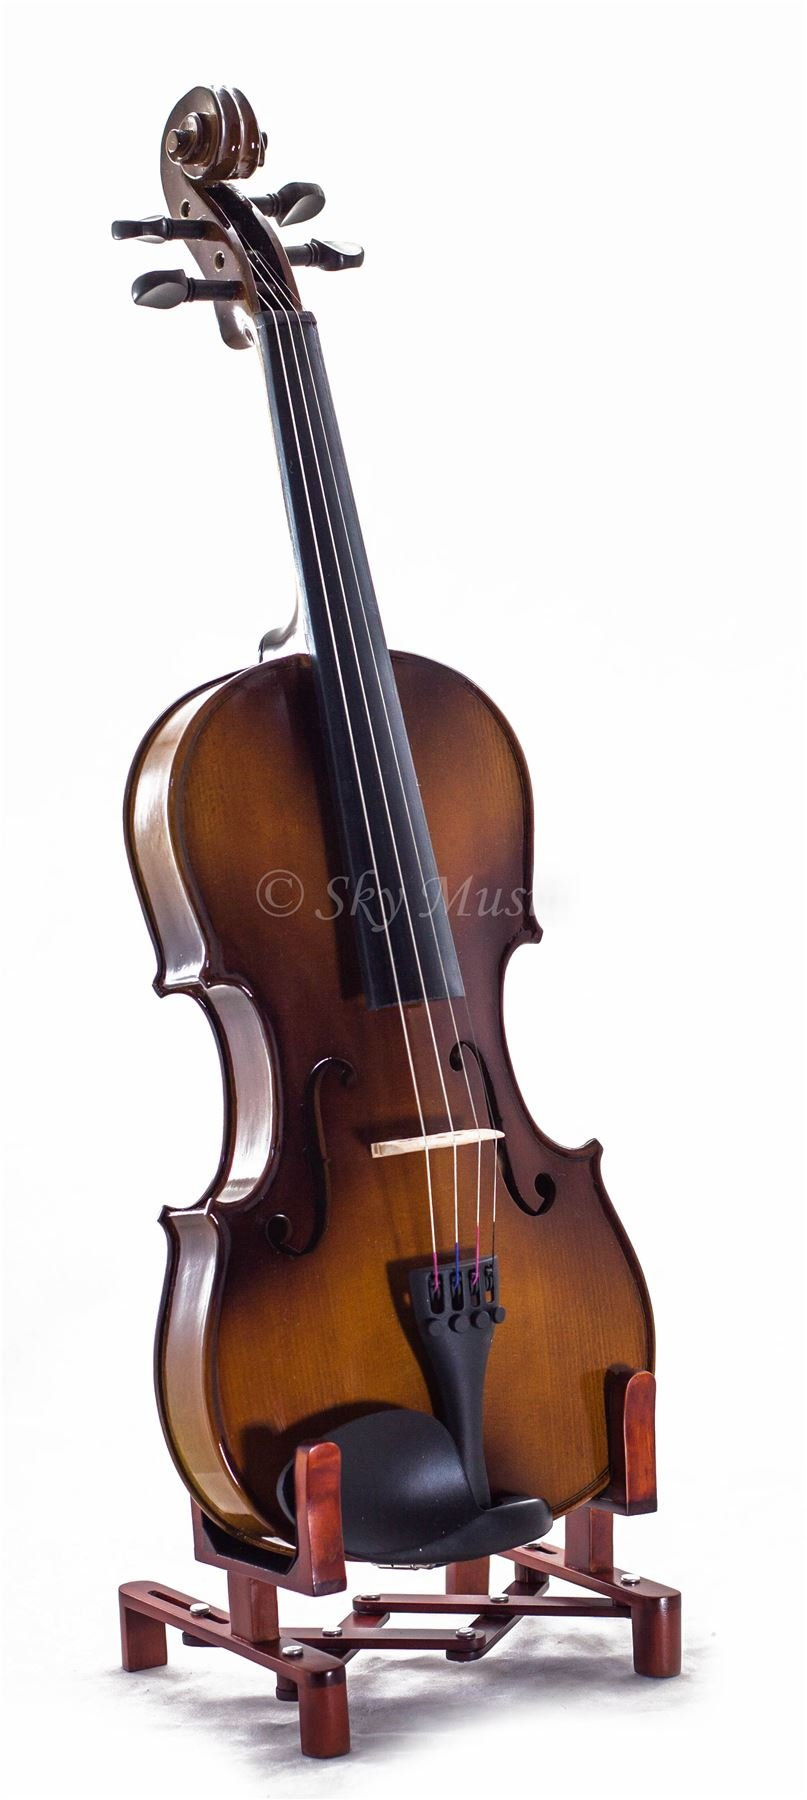 SKY 4/4 Full Size SKYVN201 Solid Maple Wood Violin by Sky (Image #2)